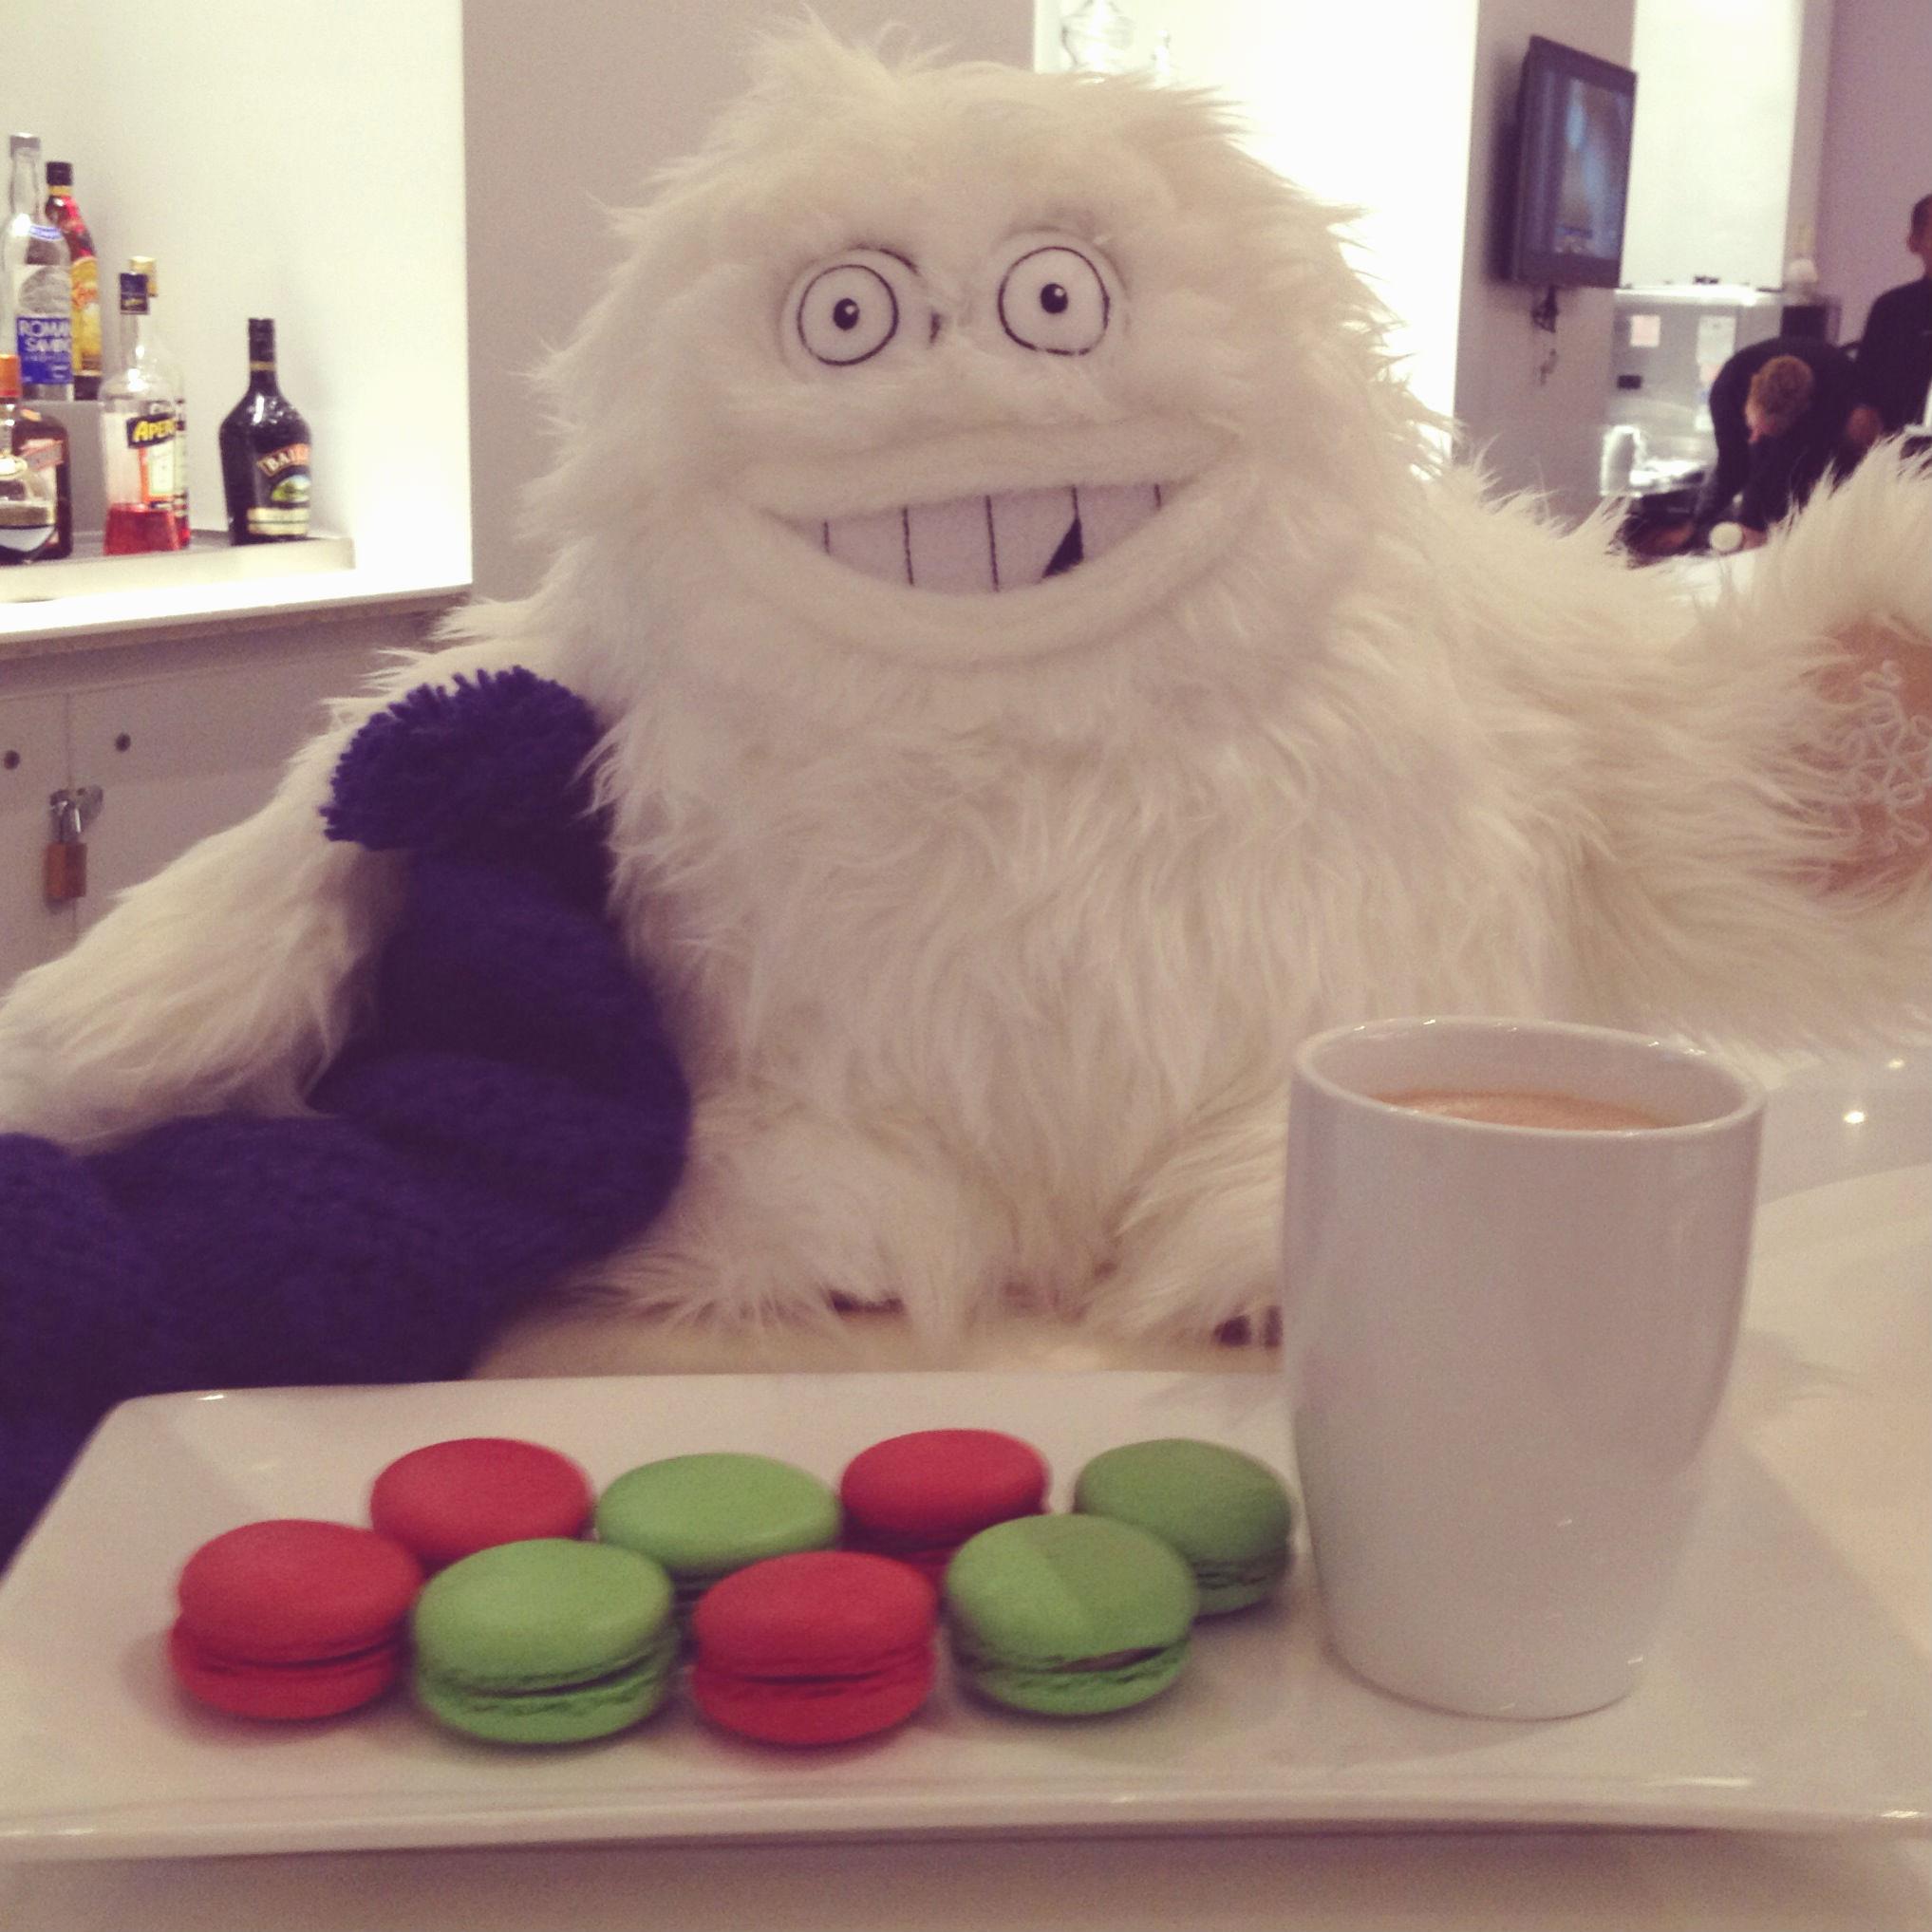 The Saks Yeti enjoying macarons and hot cocoa at SnAKS, the cafe at Saks